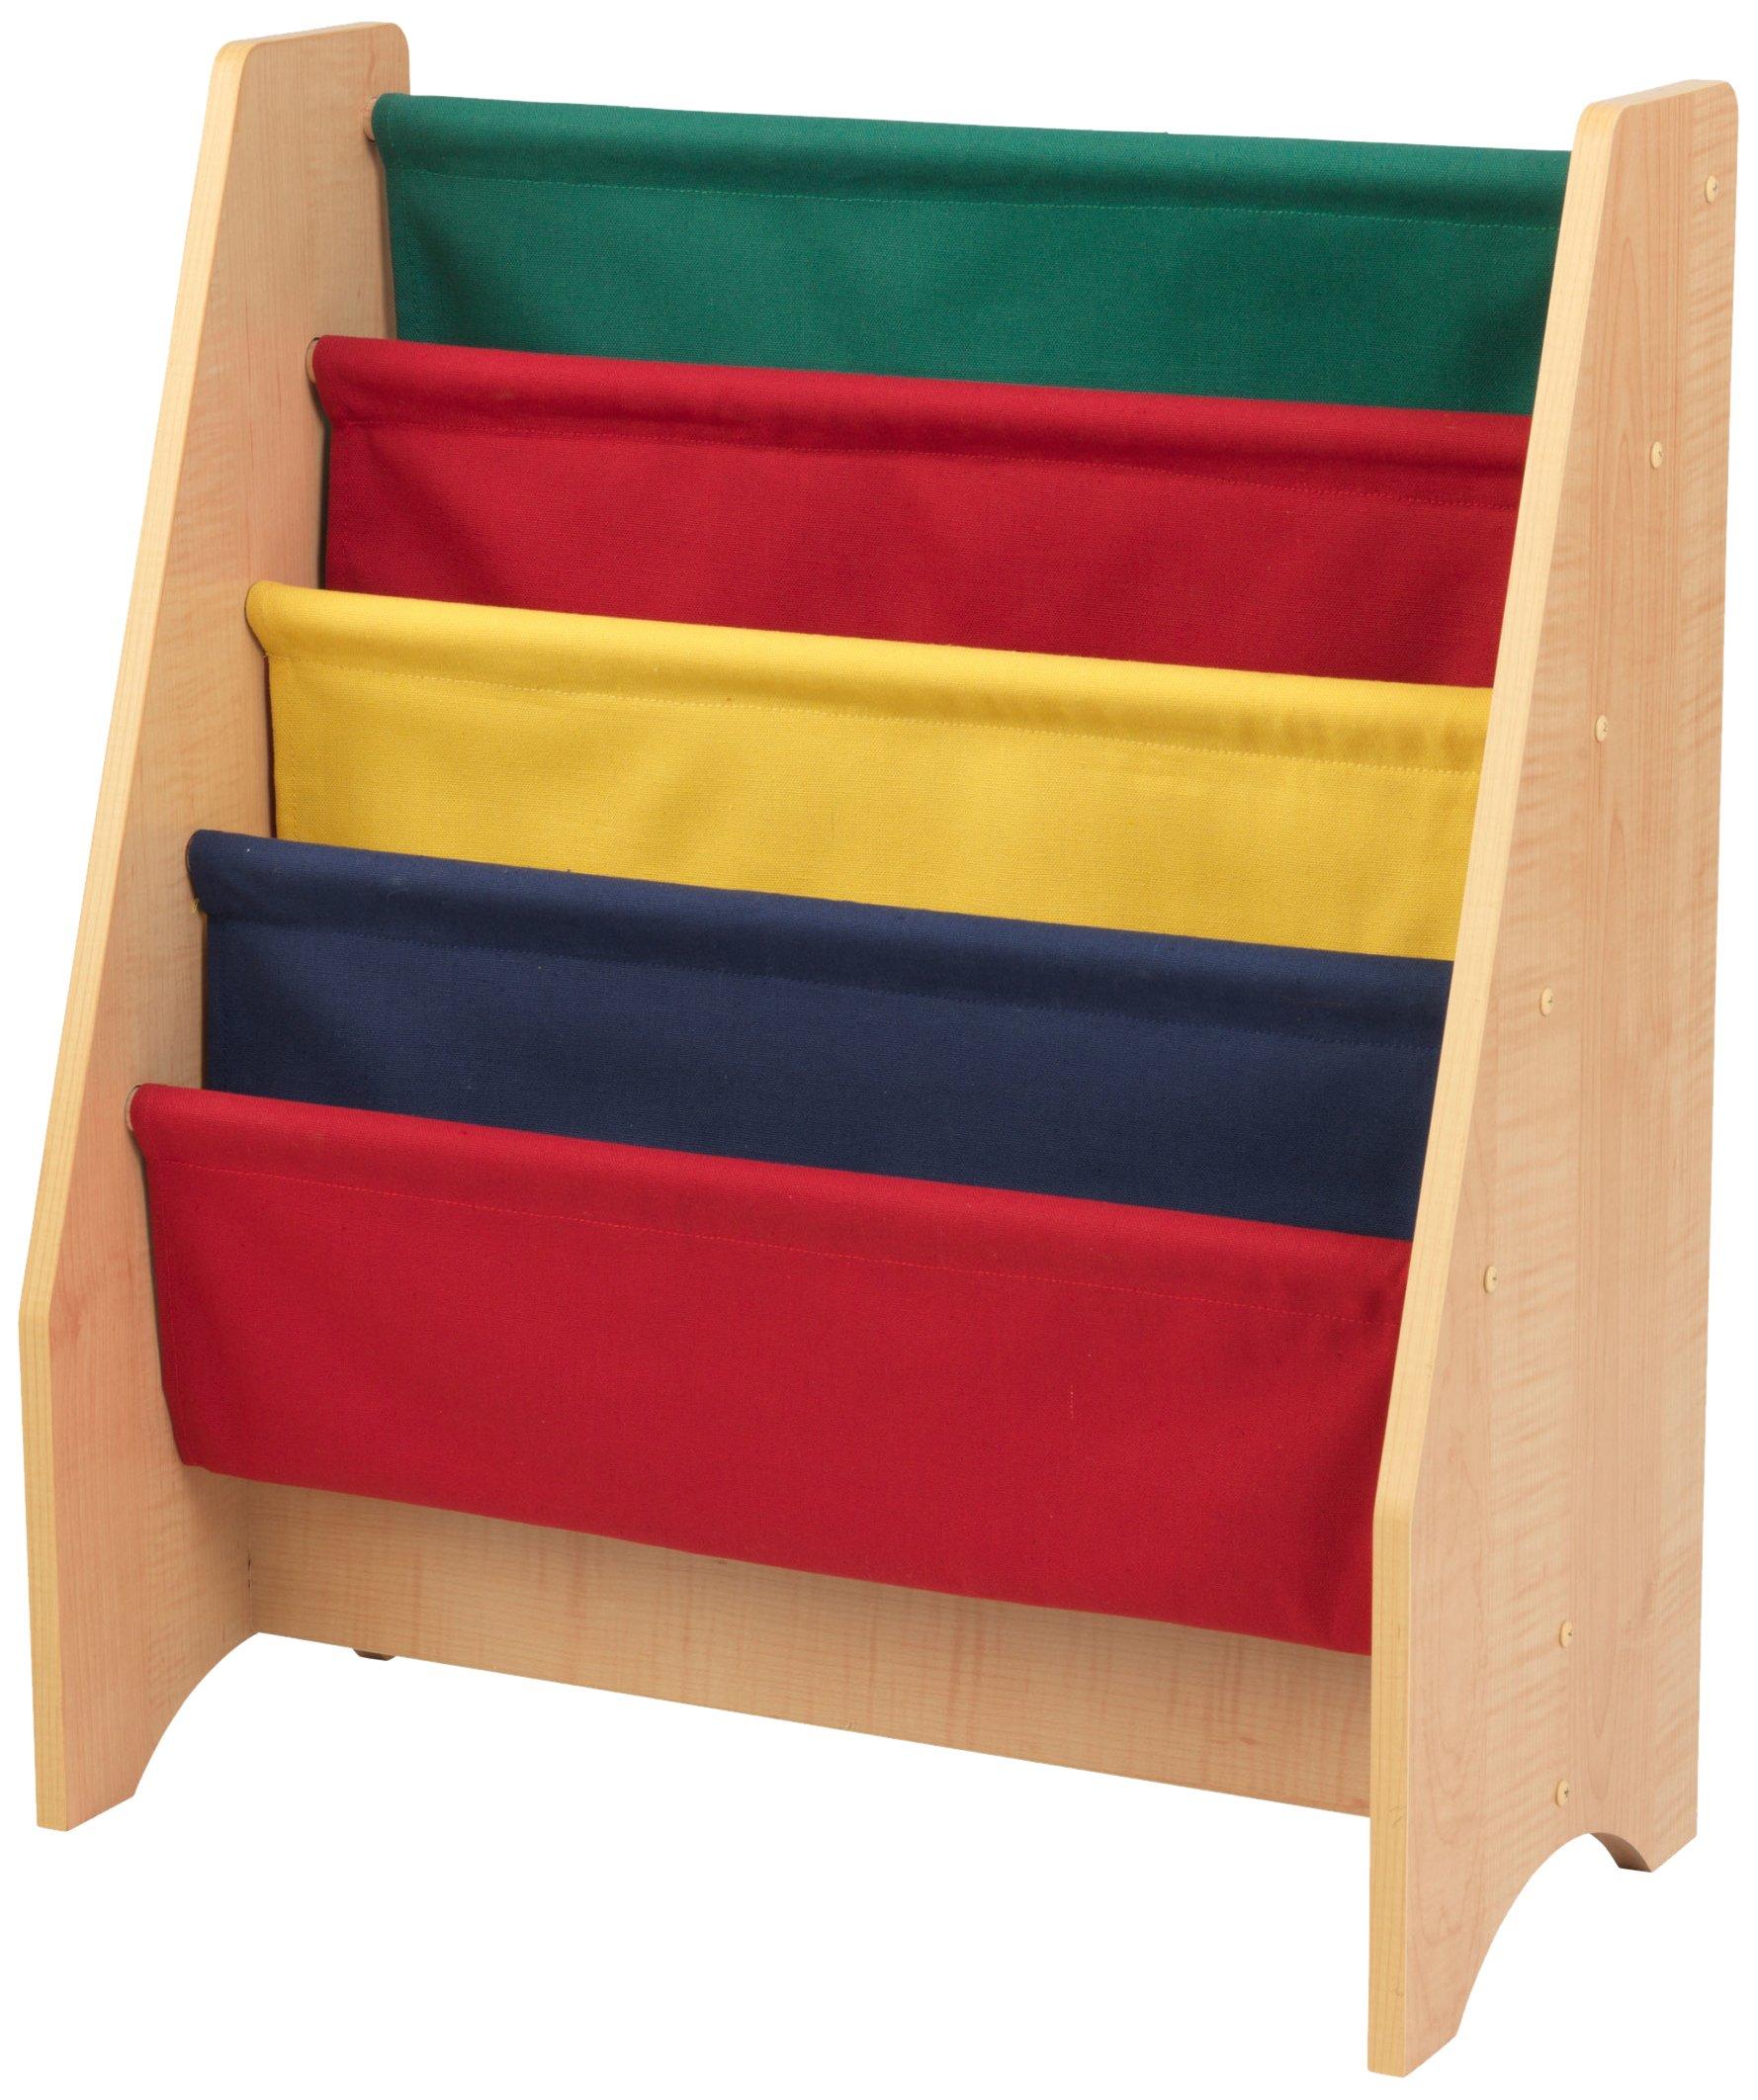 KidKraft Sling Bookshelf, Primary